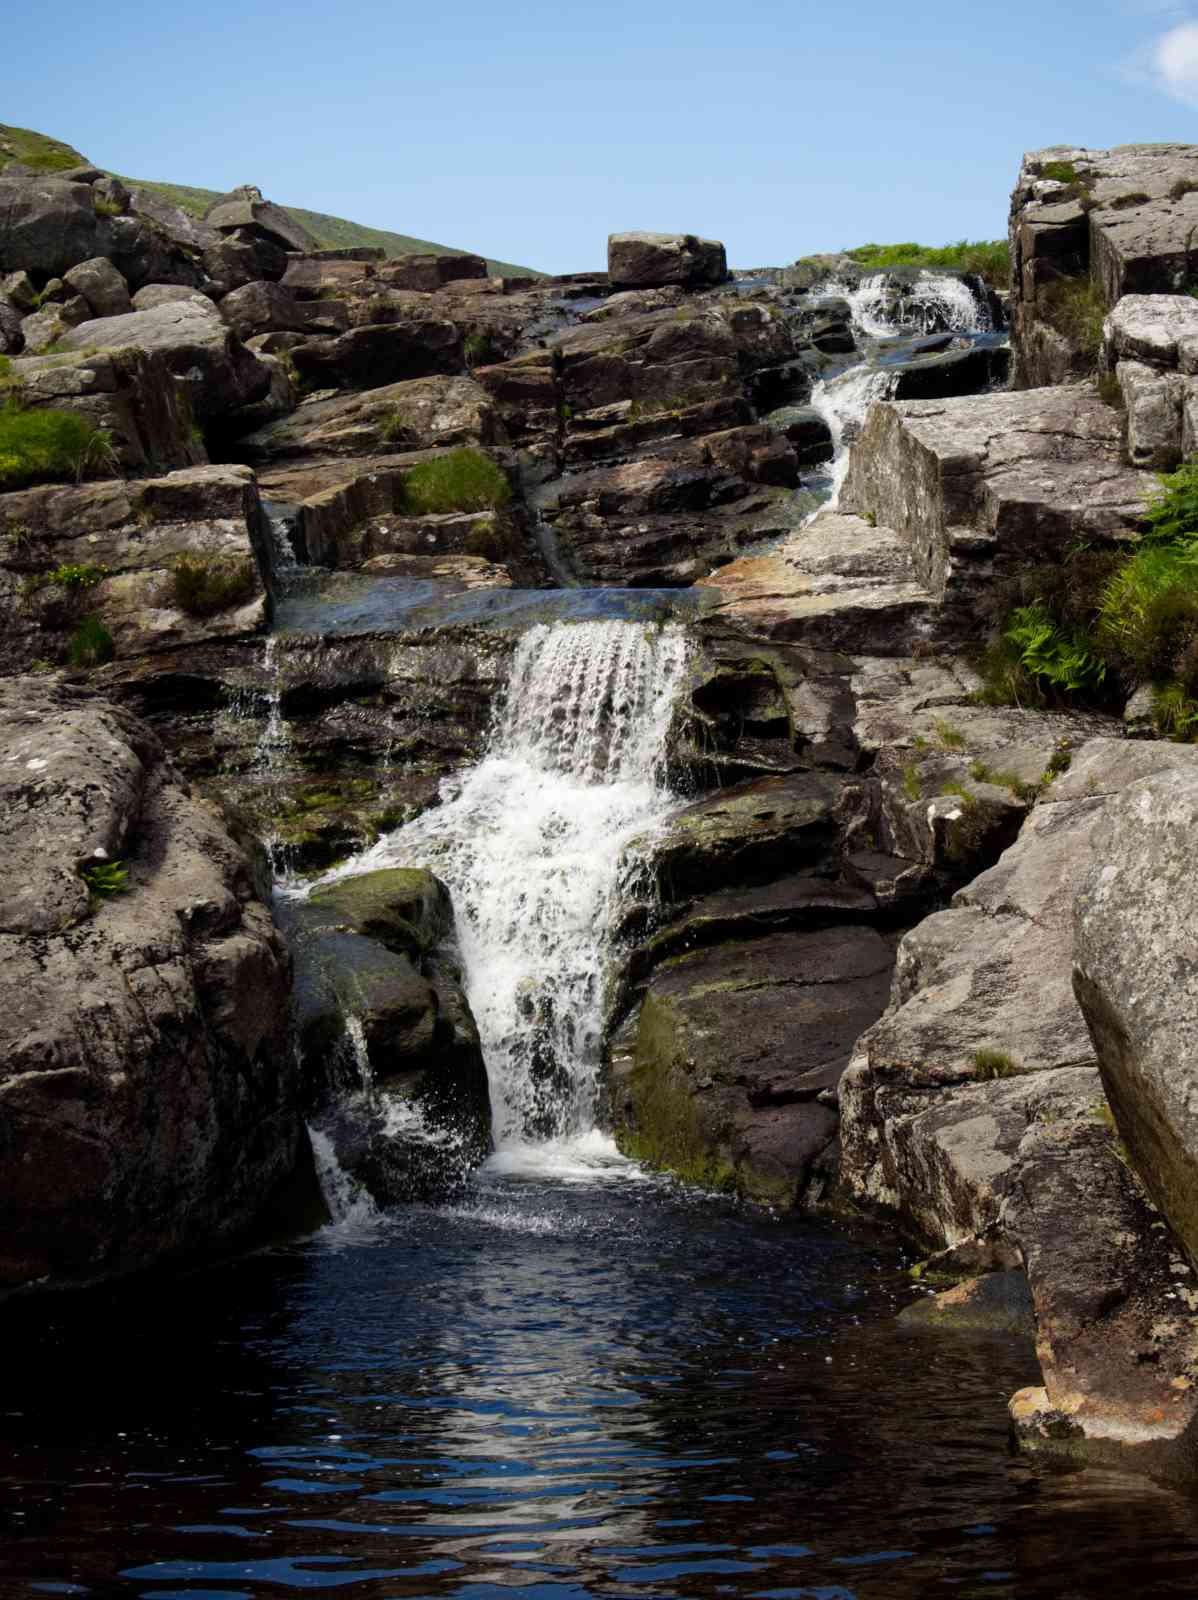 Lake Tour - Am Wasserfall entlang